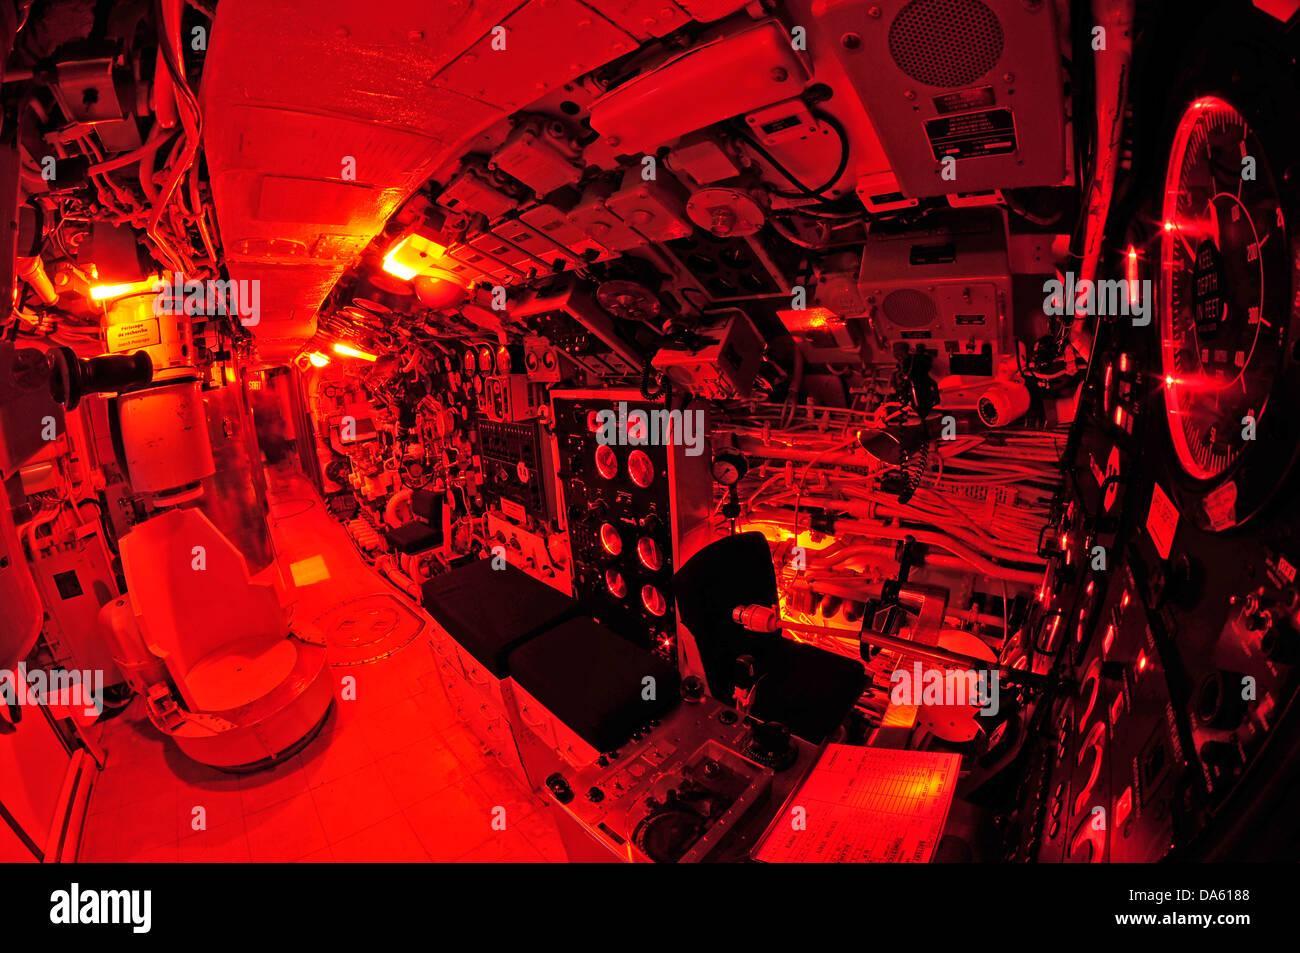 Onondaga, Submarino, Pointe au Pere, Rimouski, Canadá, Québec, históricos, Marina, miltary, interior, Imagen De Stock